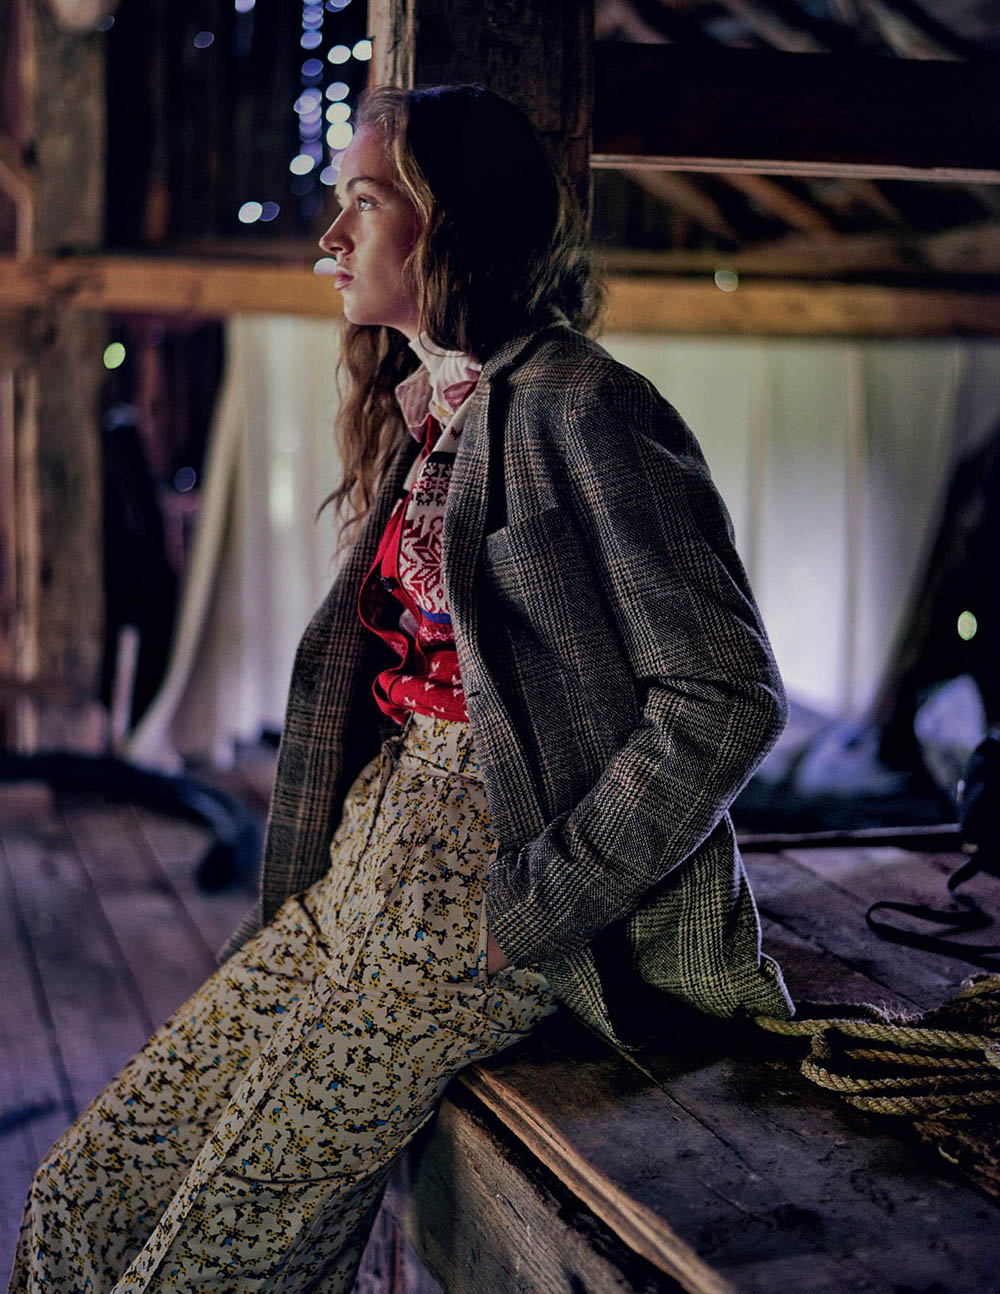 Adrienne Jüliger by Drew Jarrett for Elle Italia January 2018